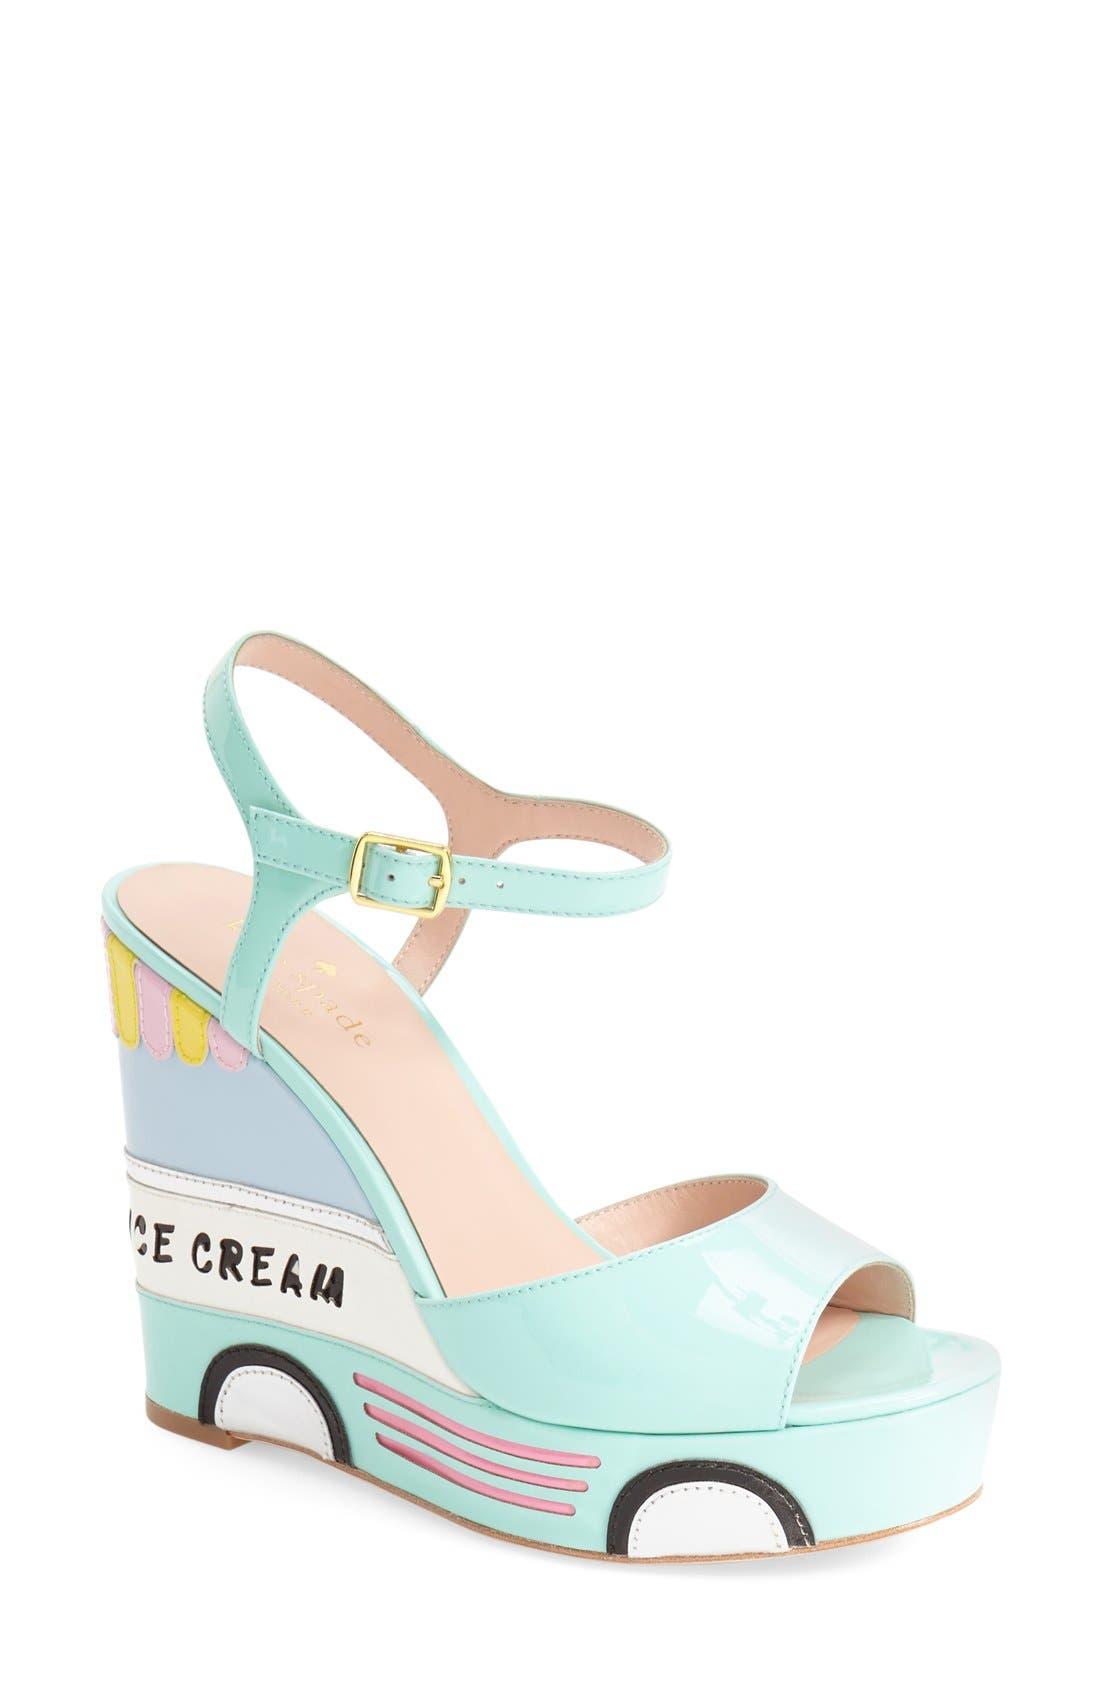 Main Image - kate spade new york 'dotty' wedge sandal (Women)